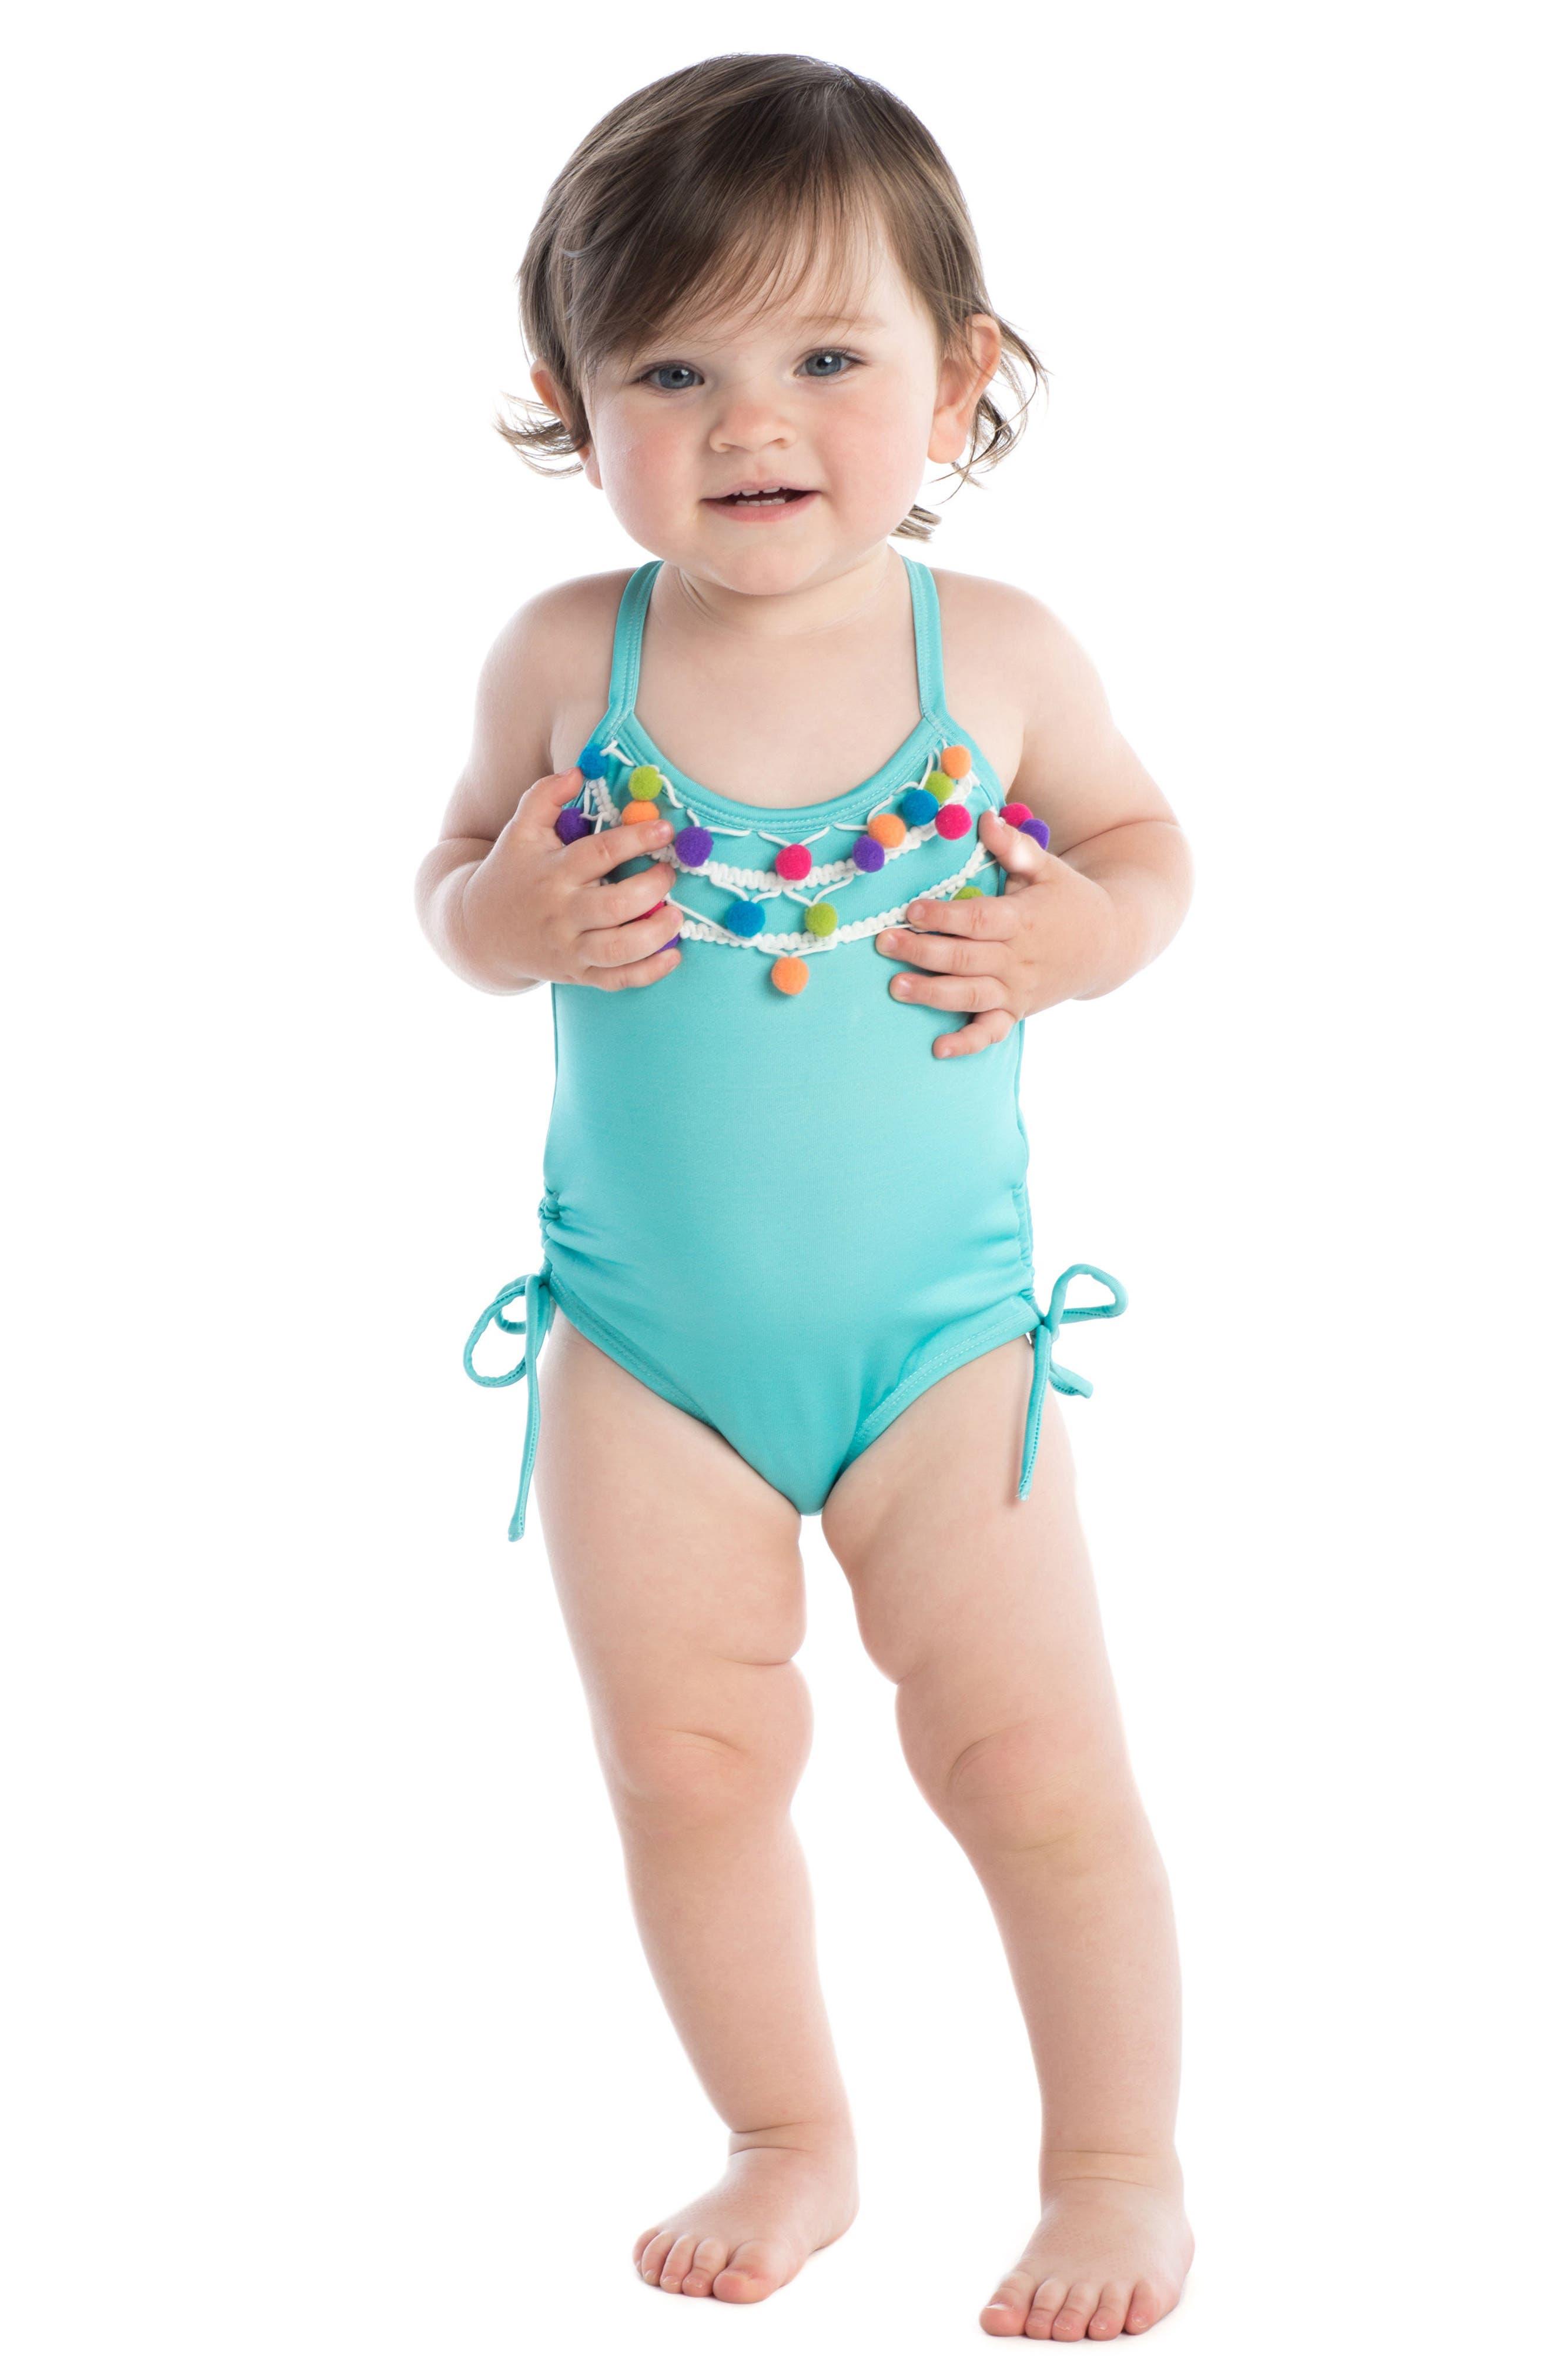 Pompom One-Piece Swimsuit,                             Alternate thumbnail 3, color,                             400